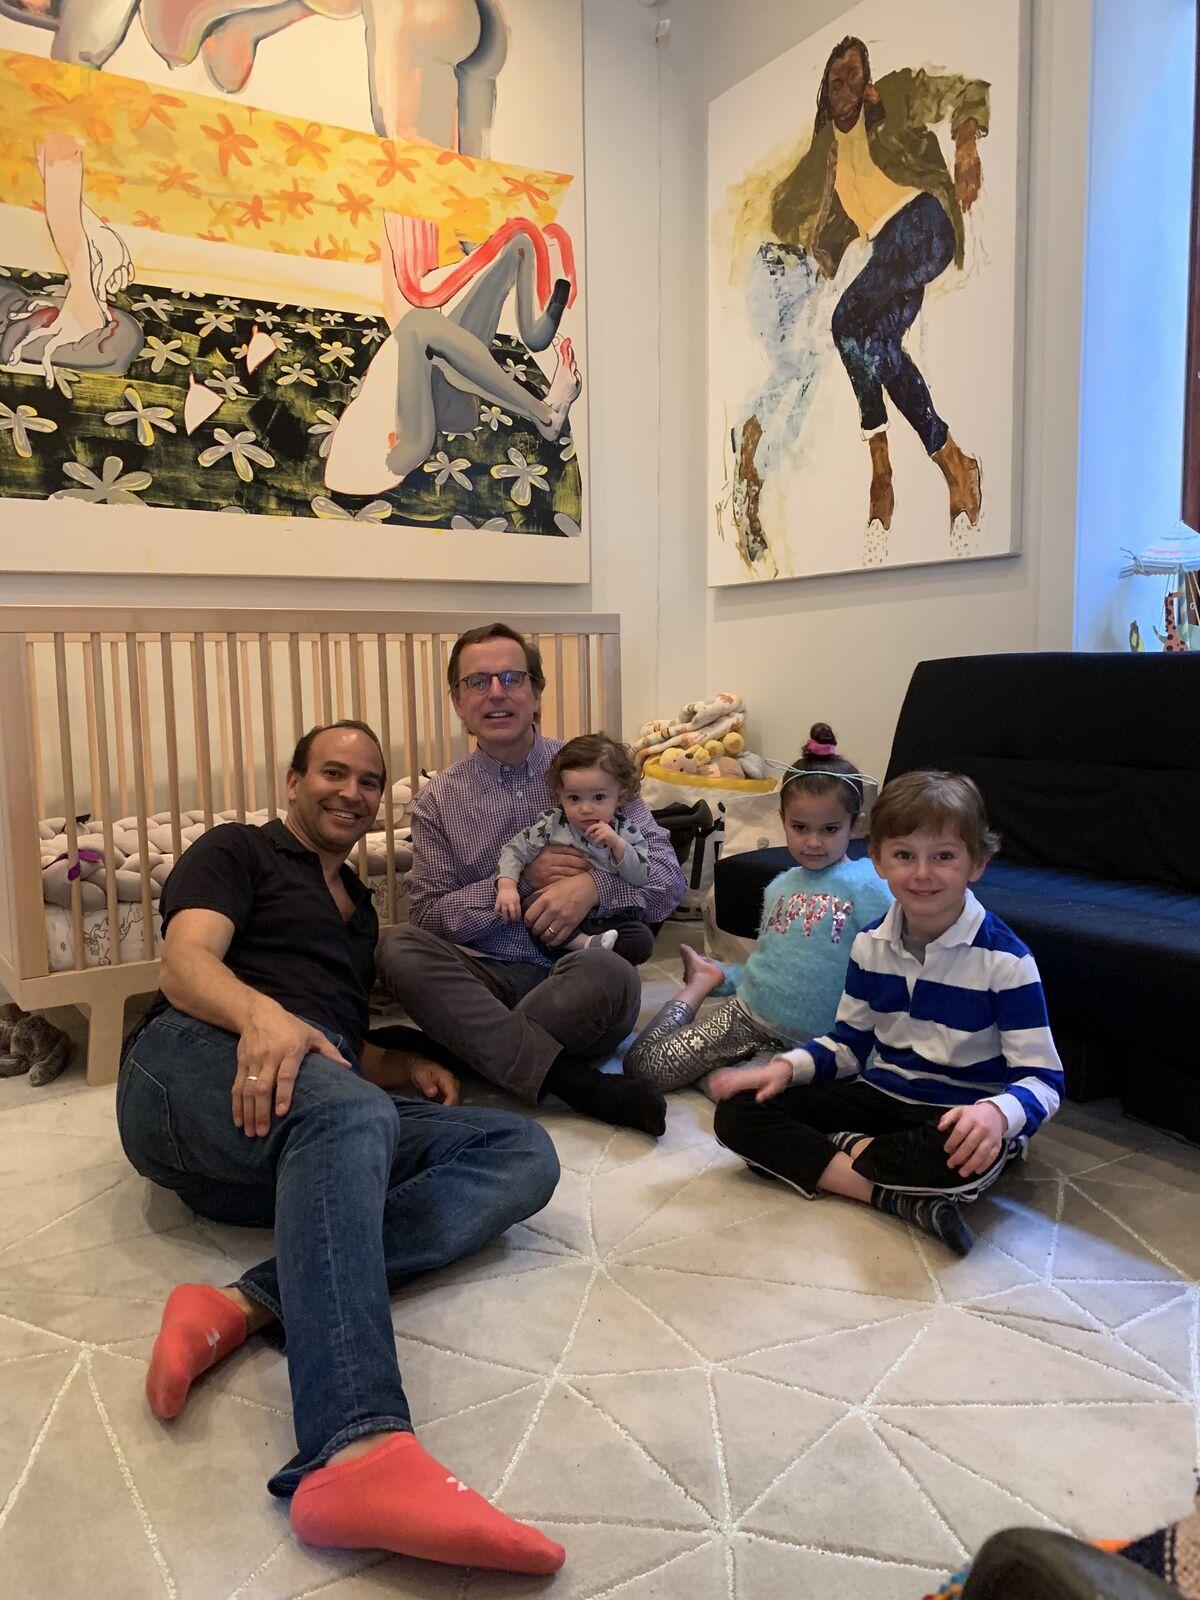 Bernard Lumpkin, Carmine Boccuzzi, and their children with Christina Quarles, Faced, 2016 and Jennifer Packer, Joyce, 2012. Courtesy of Bernard Lumpkin.